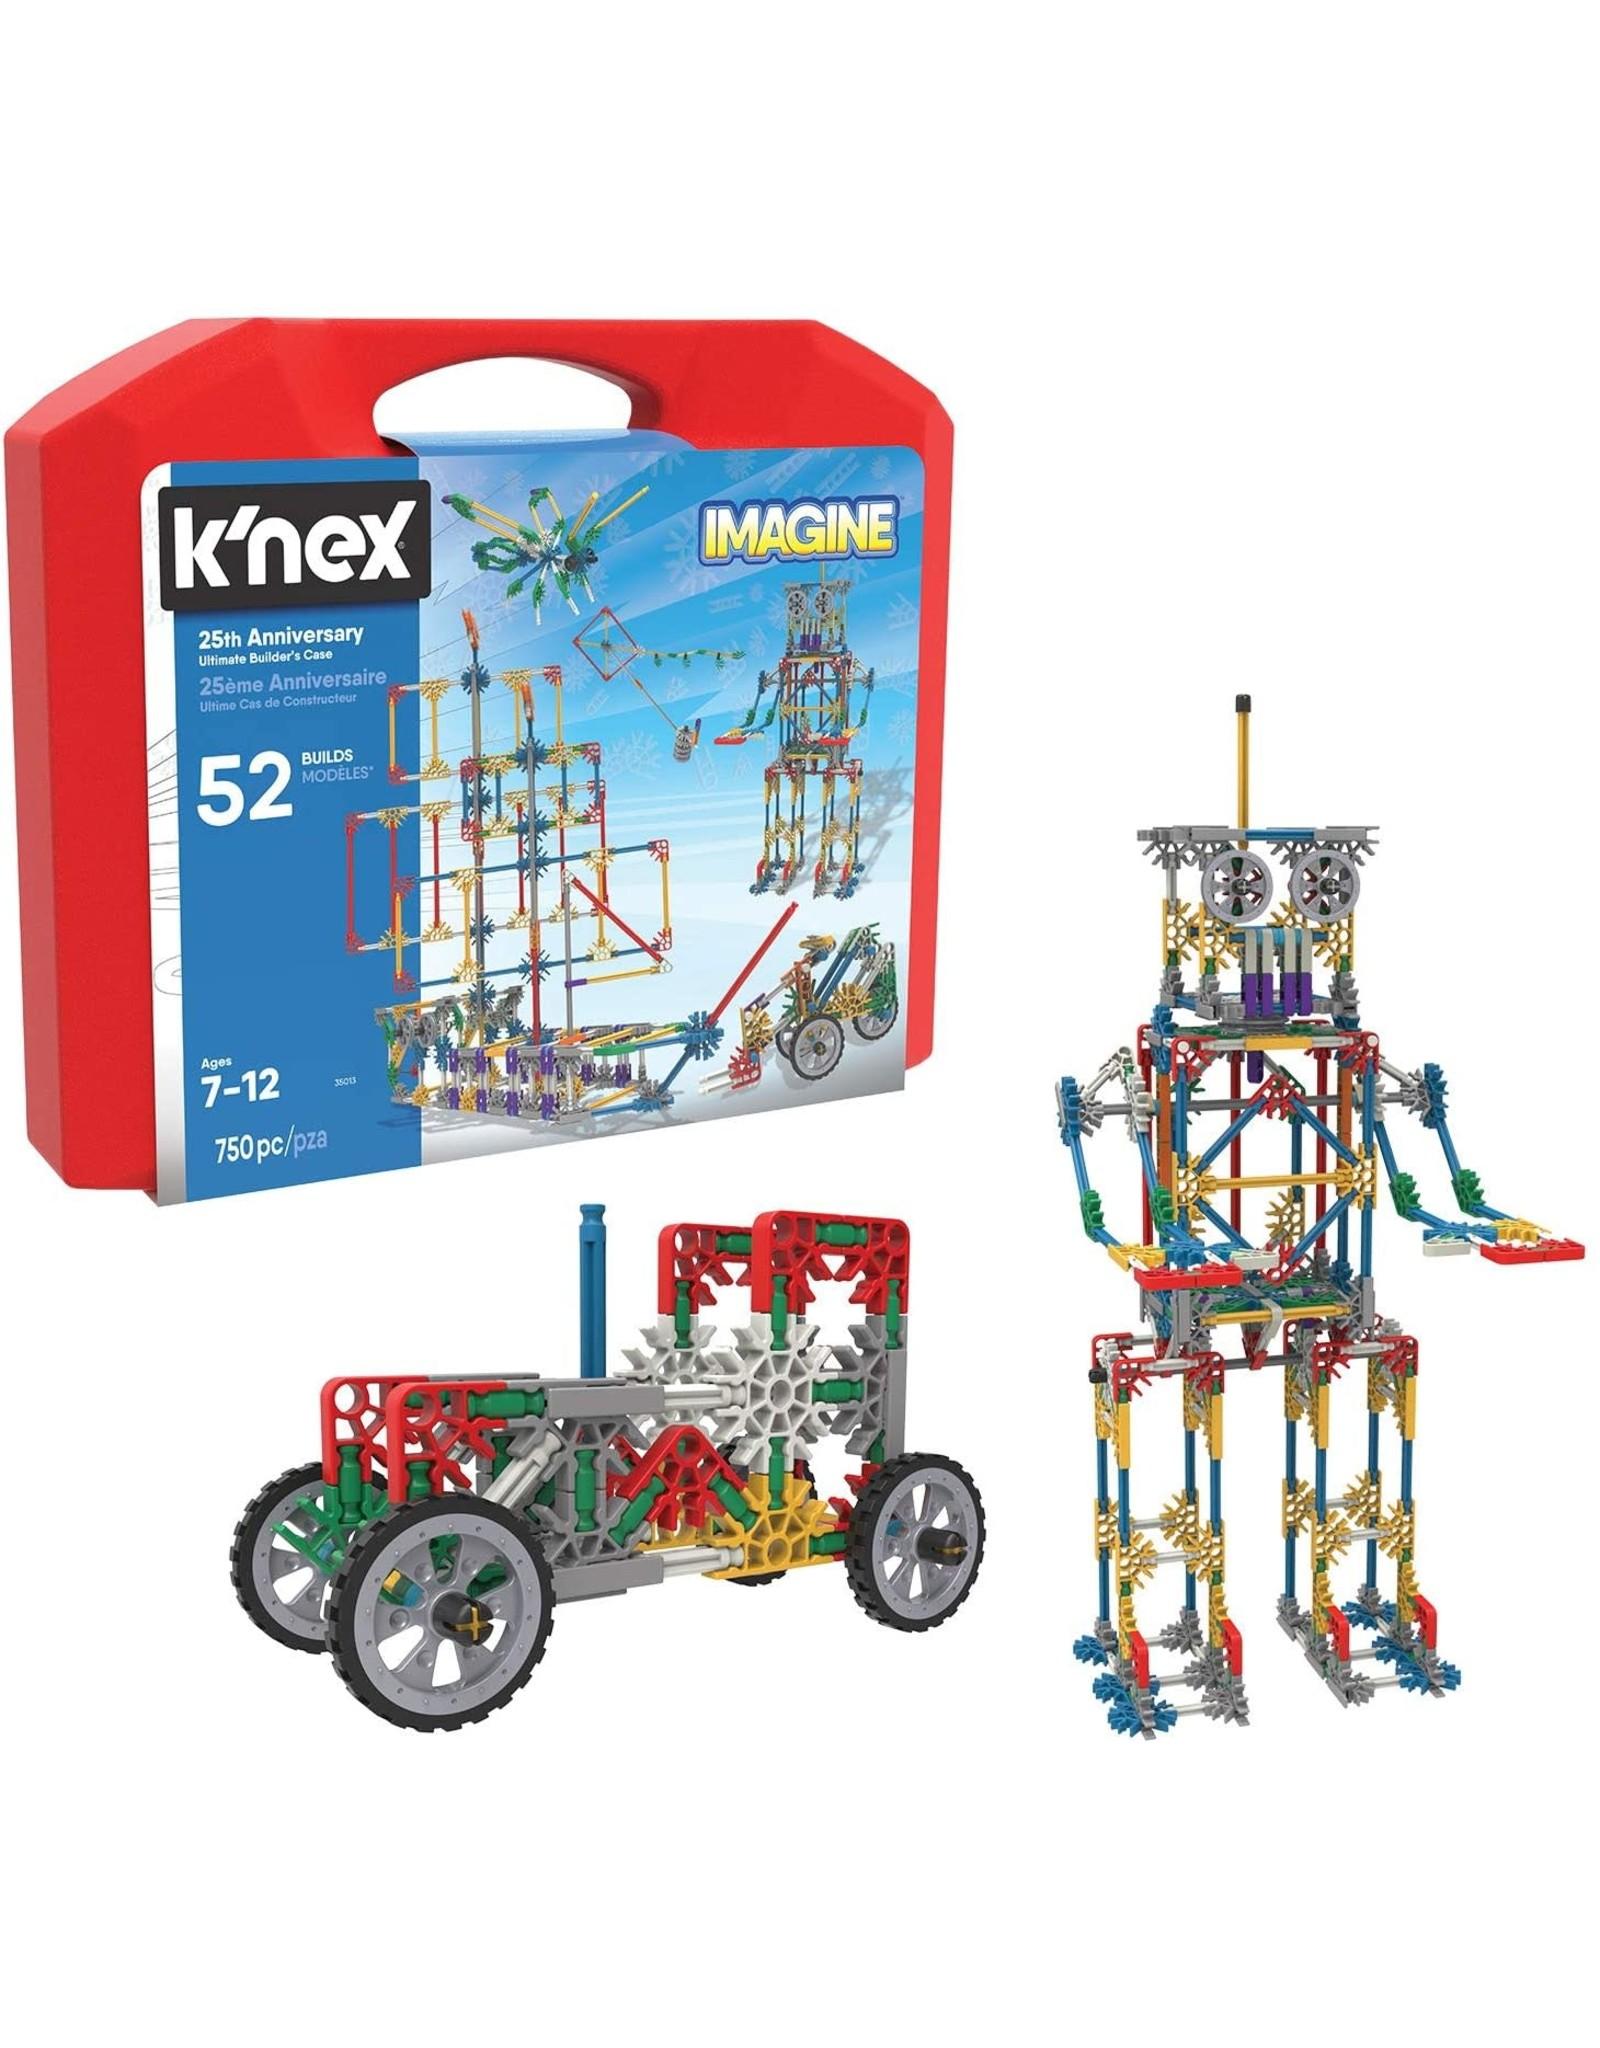 K'Nex 25th Anniversary Ultimate Builders Case